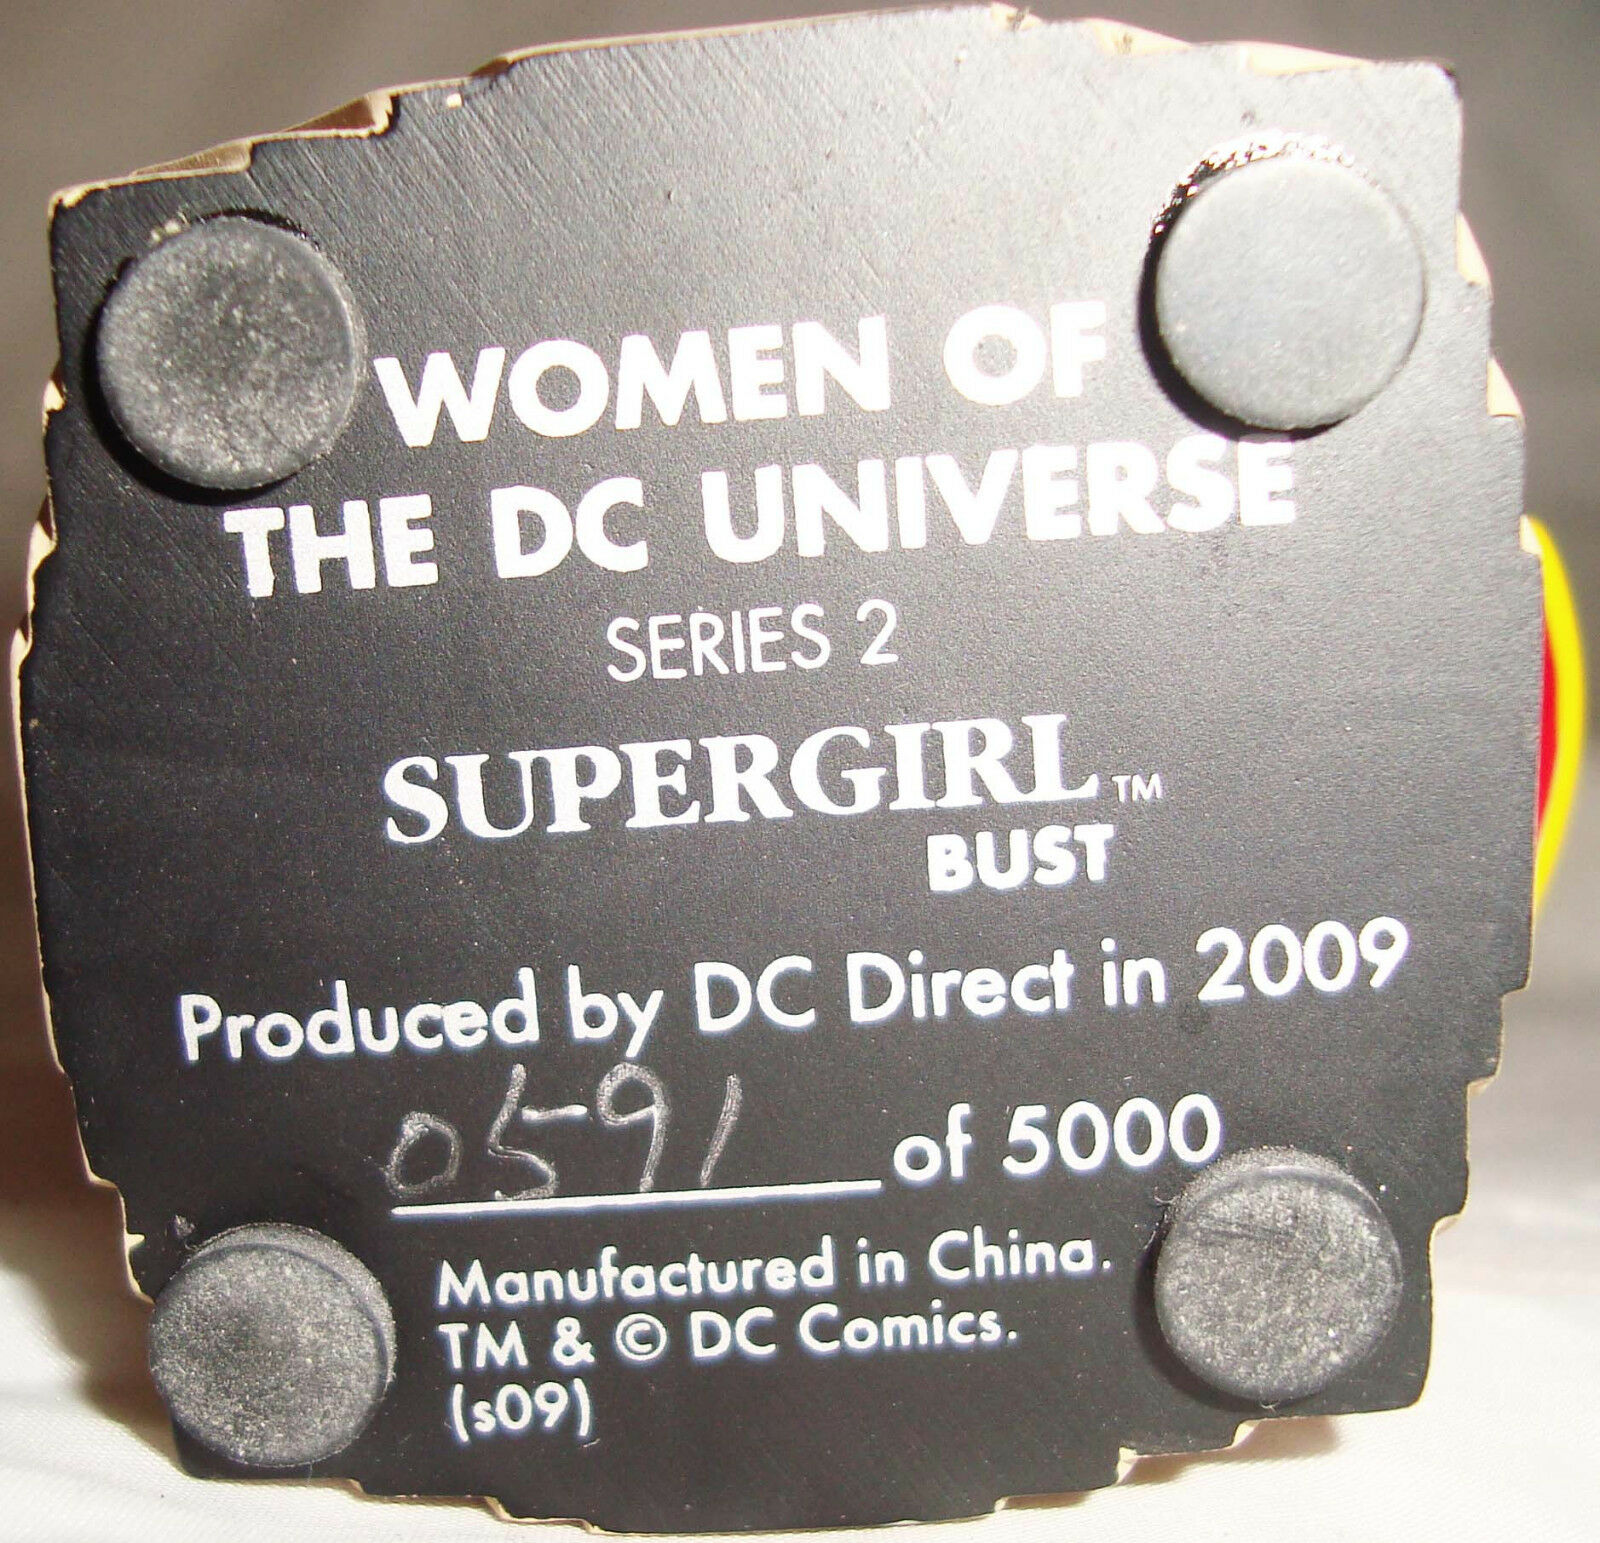 DC COMIC COMIC COMIC WOMEN OF DC UNIVERSE SUPERGIRL BUST NEW (READ AUCTION) ec5815